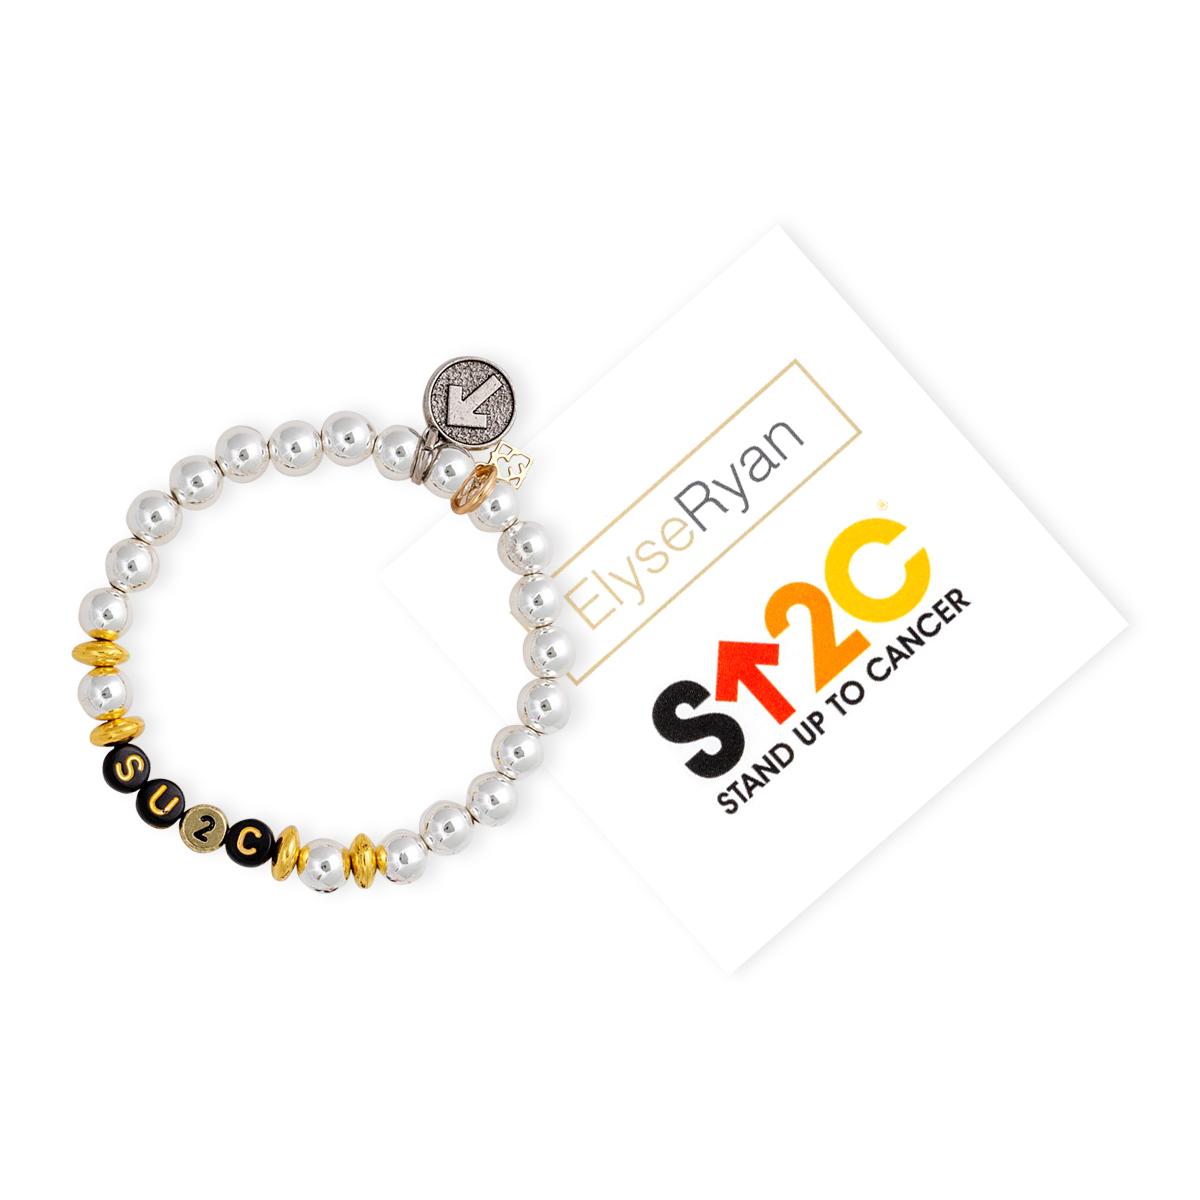 SU2C World Cancer Day SU2C Bracelet